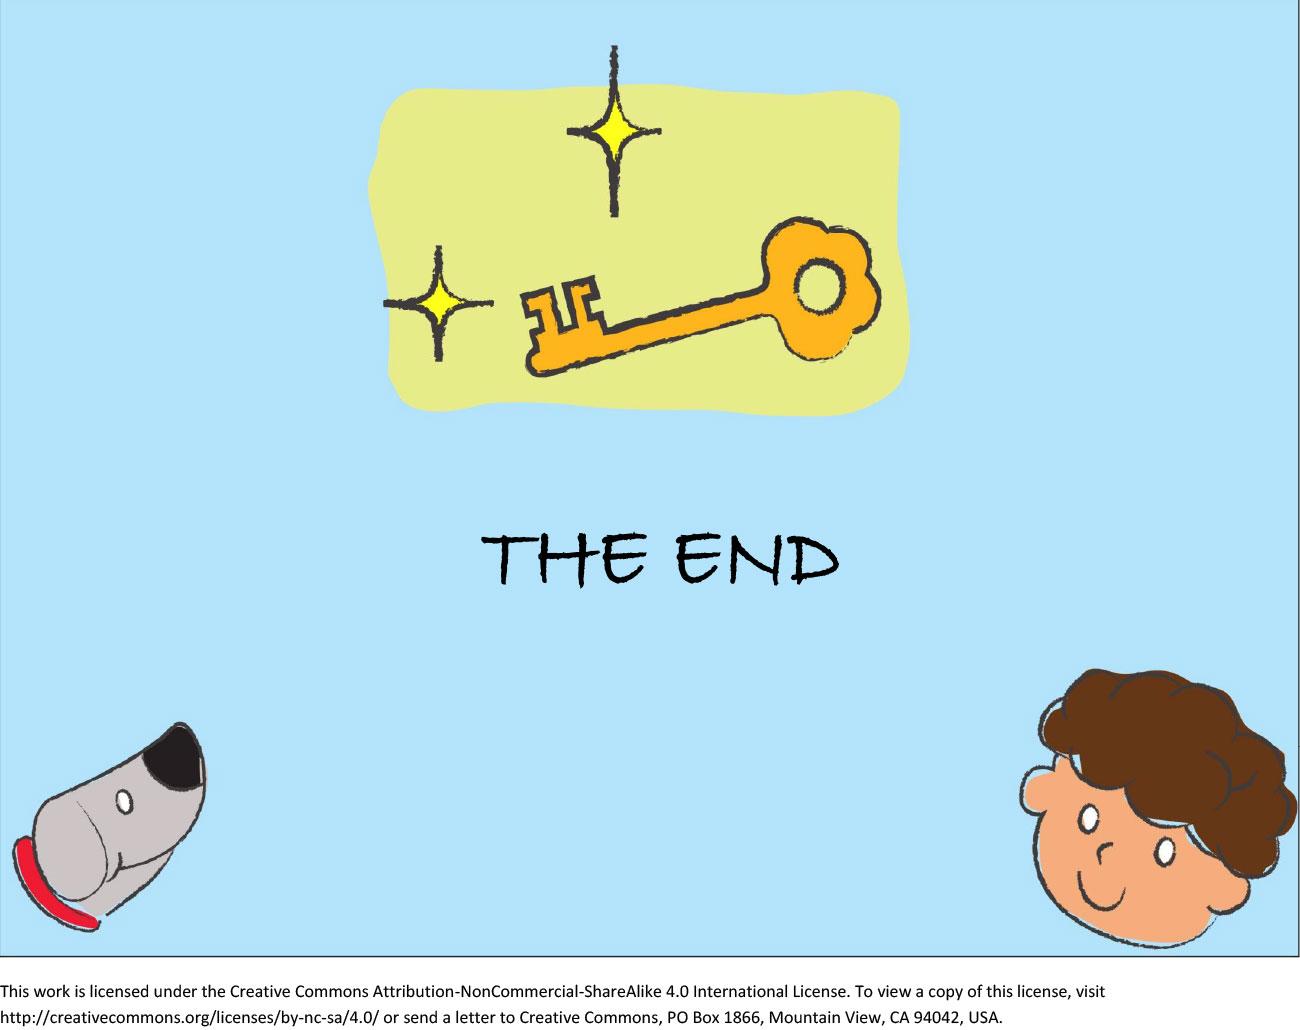 kids short story 'Down the memory lane with nash' by uma bala devarakonda - page 17